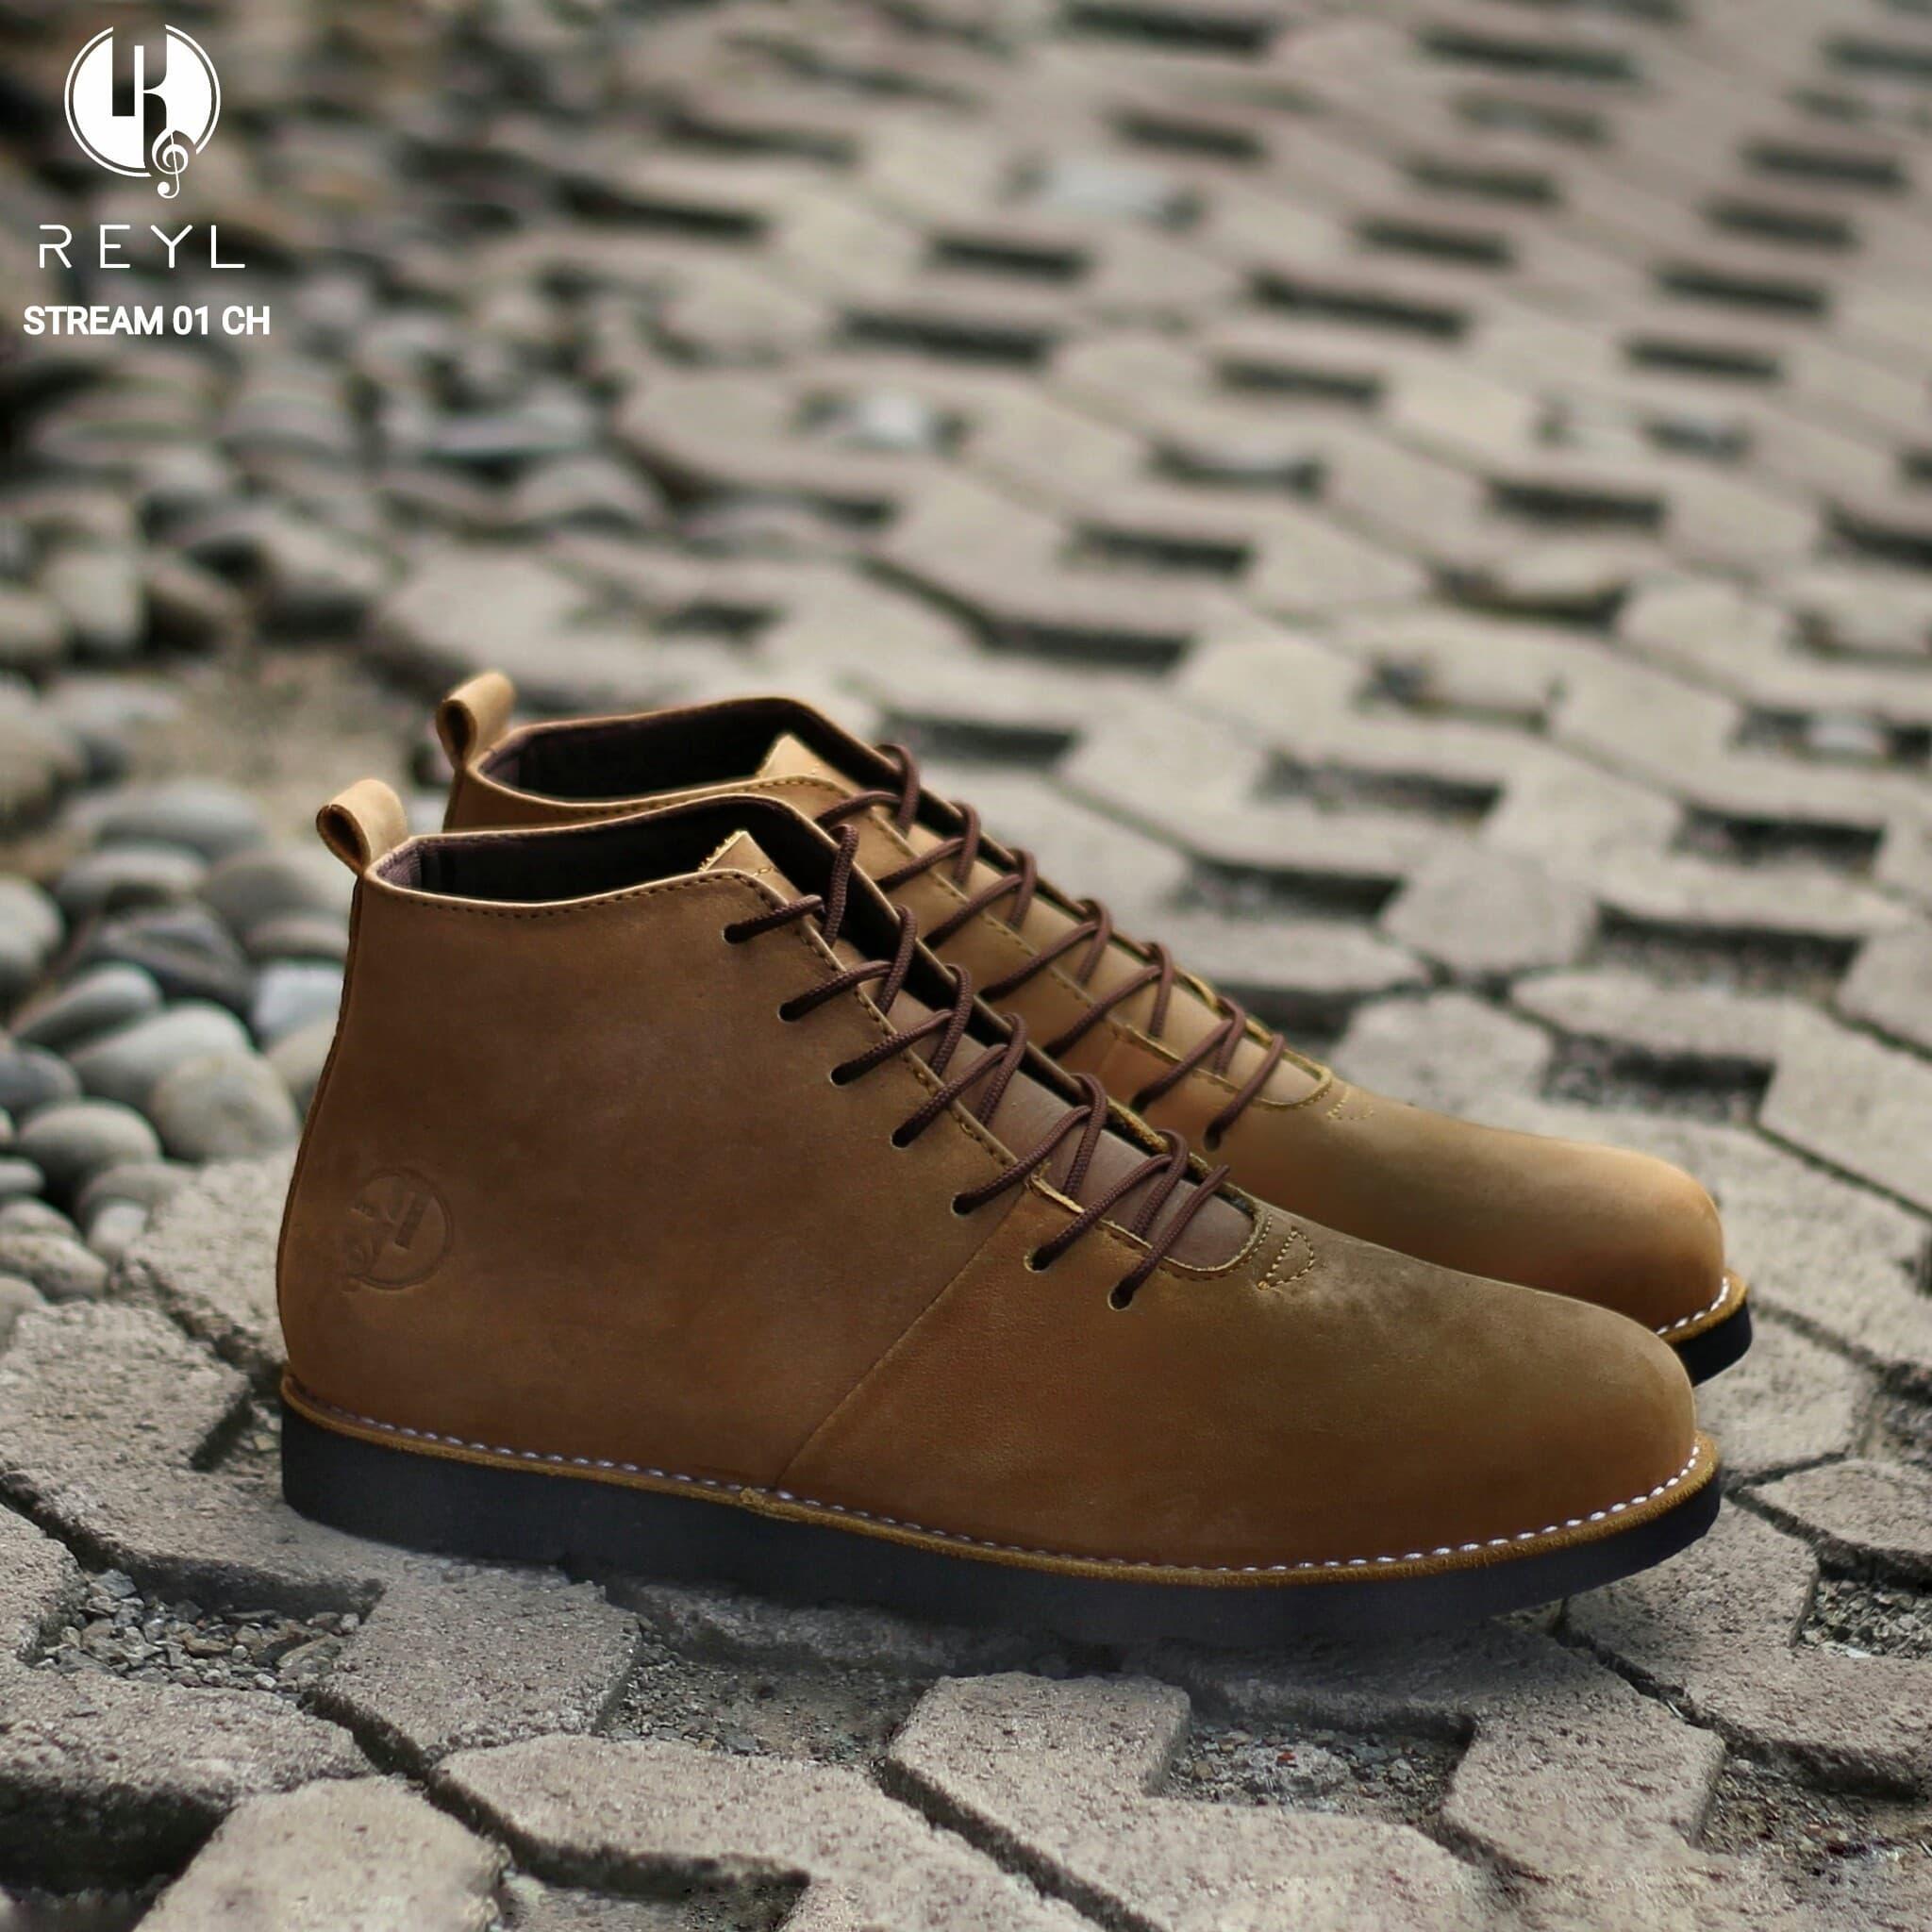 DISKON Sepatu Pantofel Pria REYL Stream 01 CH Original Kulit Asli Fornal 4f5f43f179